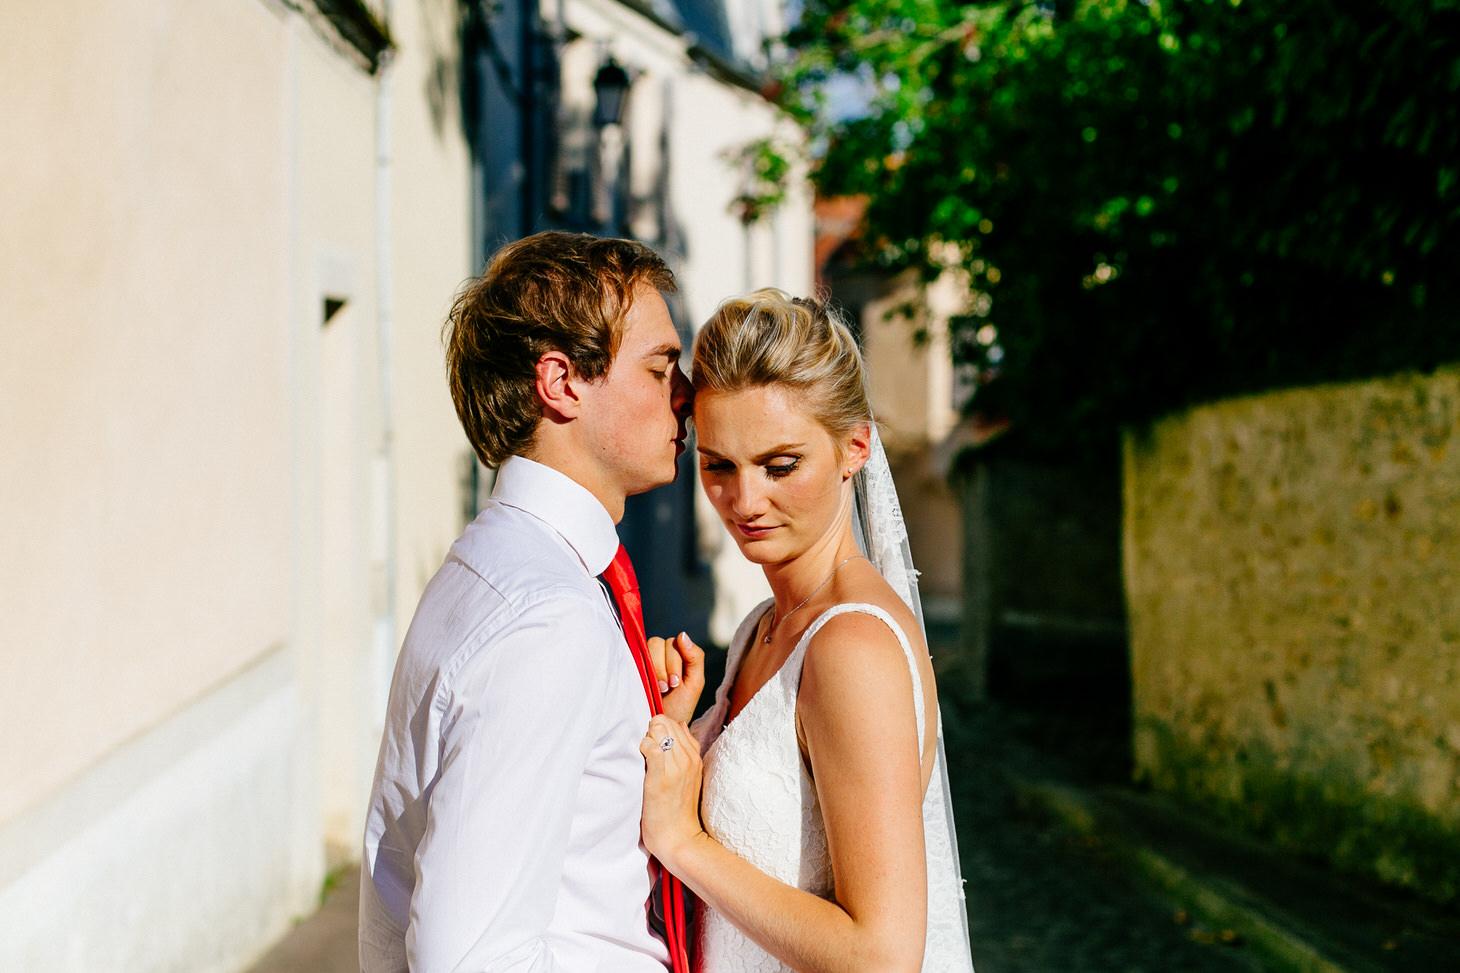 photographe-mariage-paris-montfort-l-amaury-060